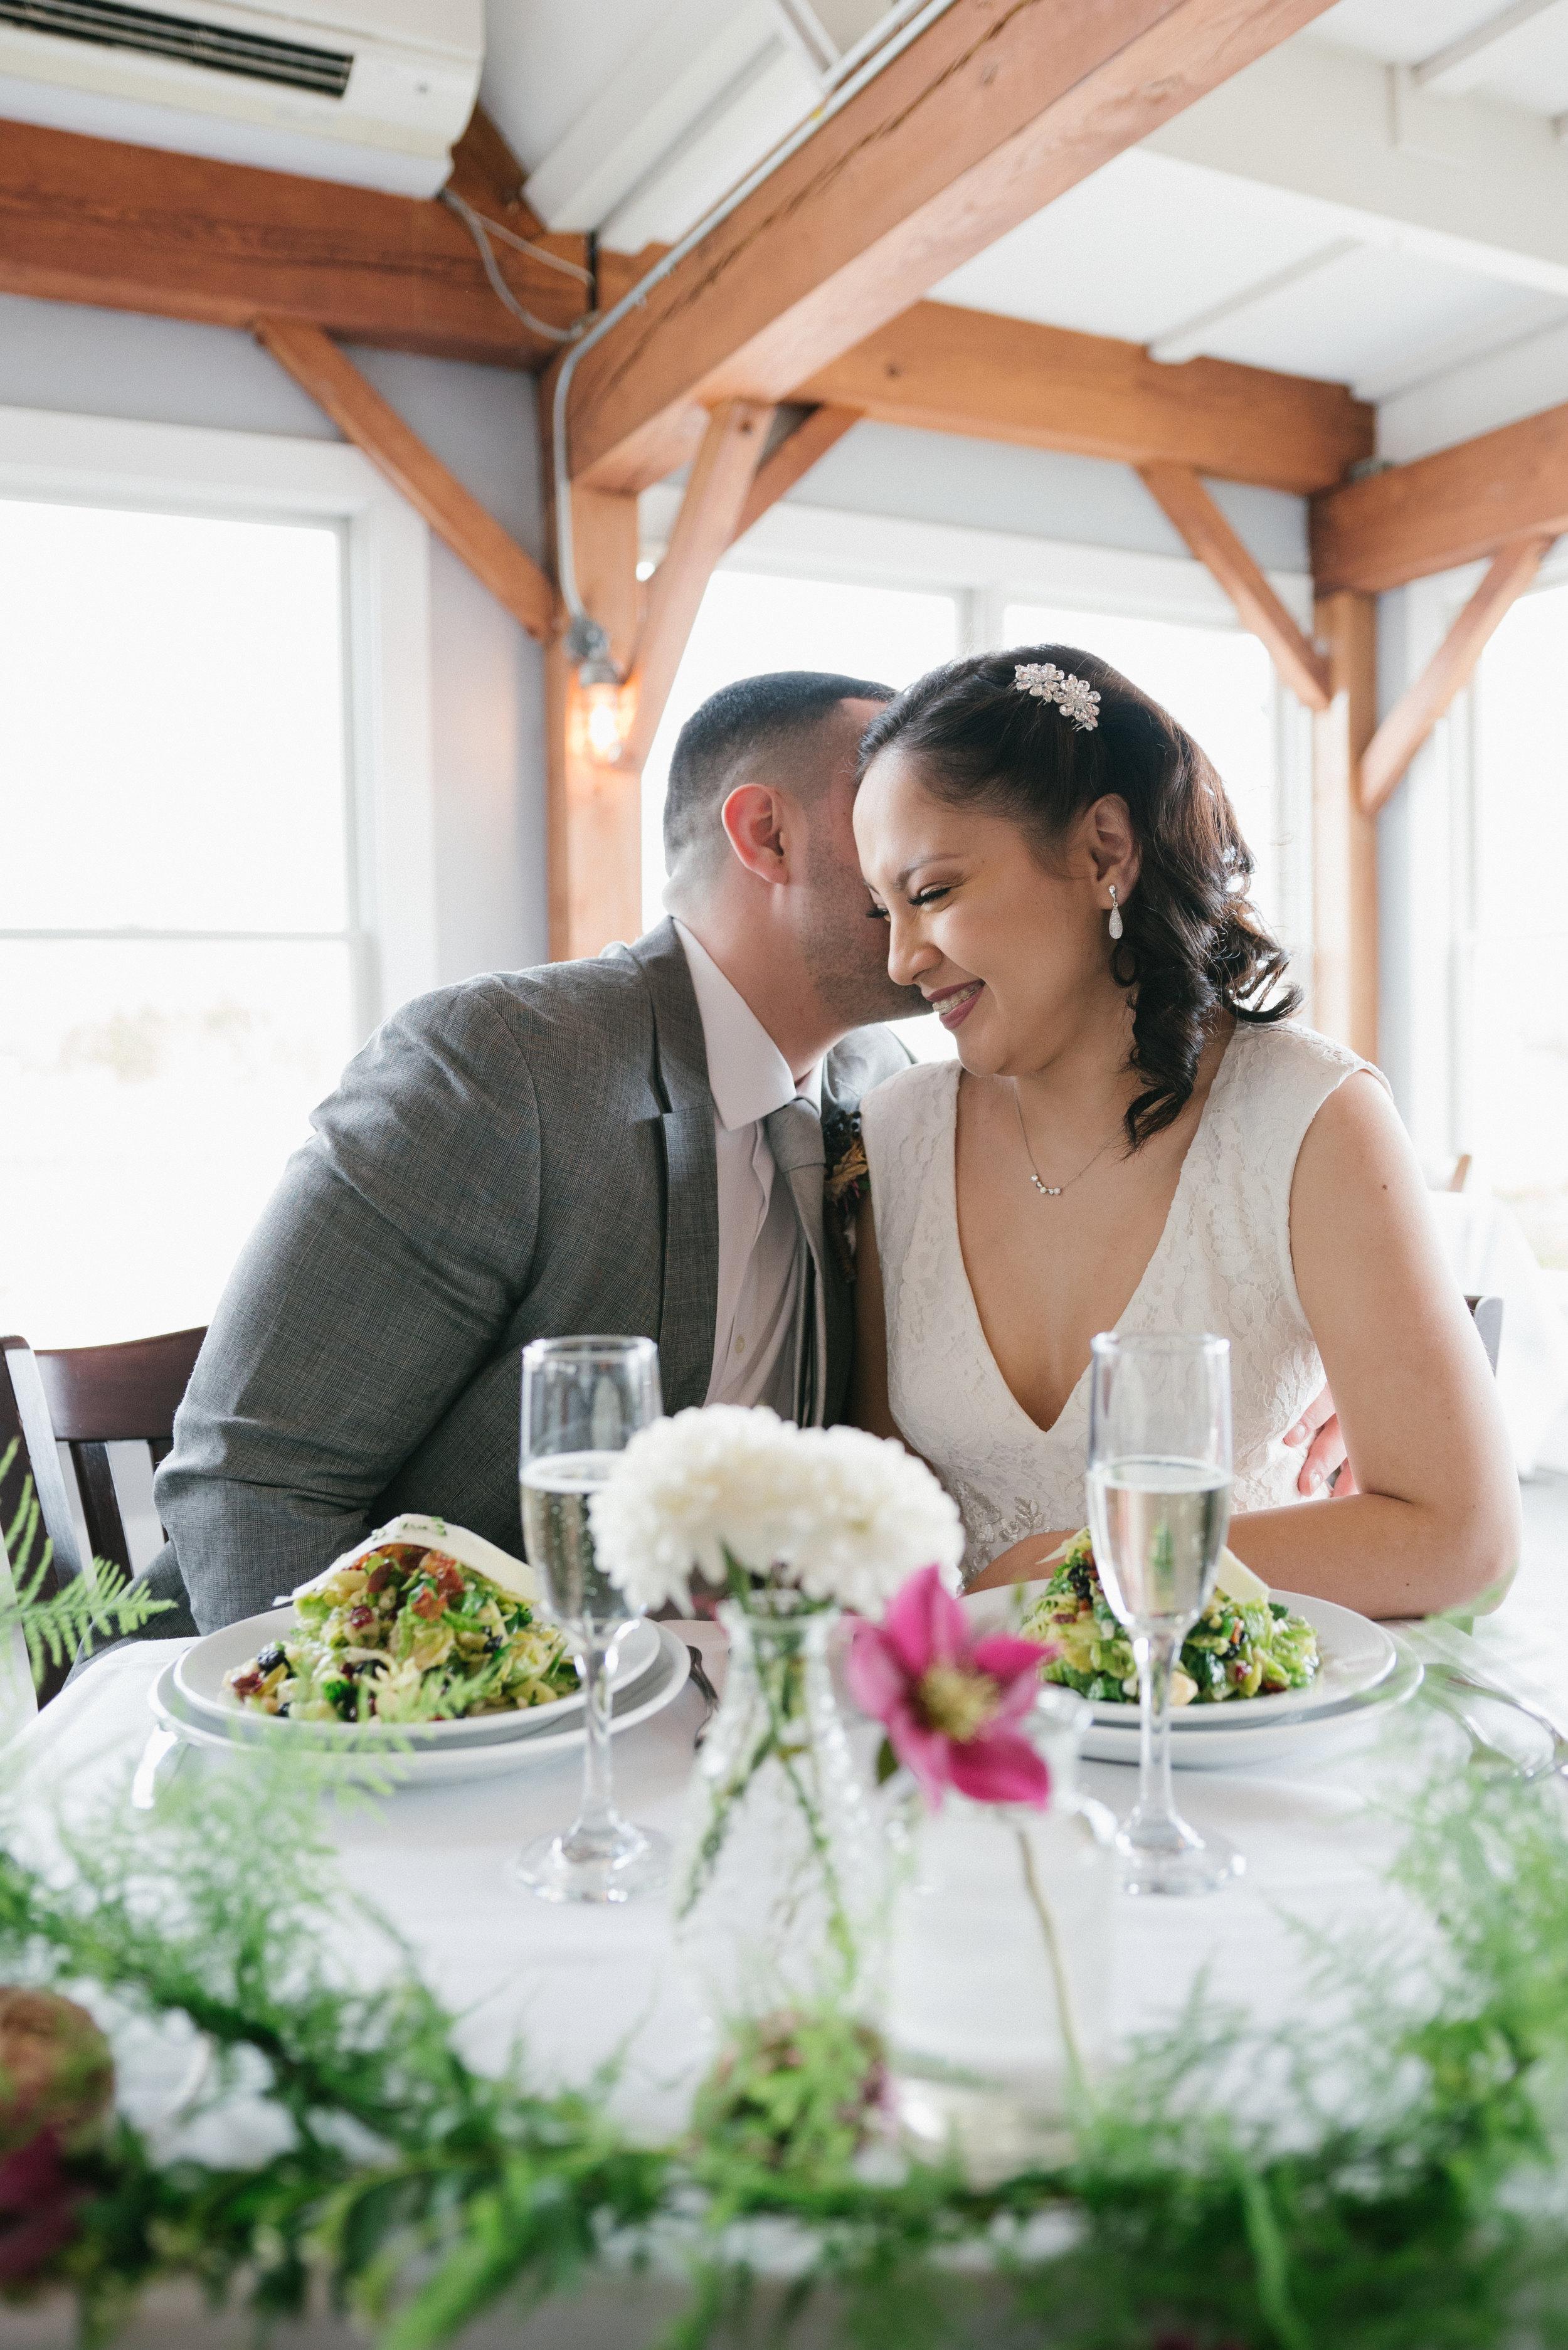 Spring wedding colors